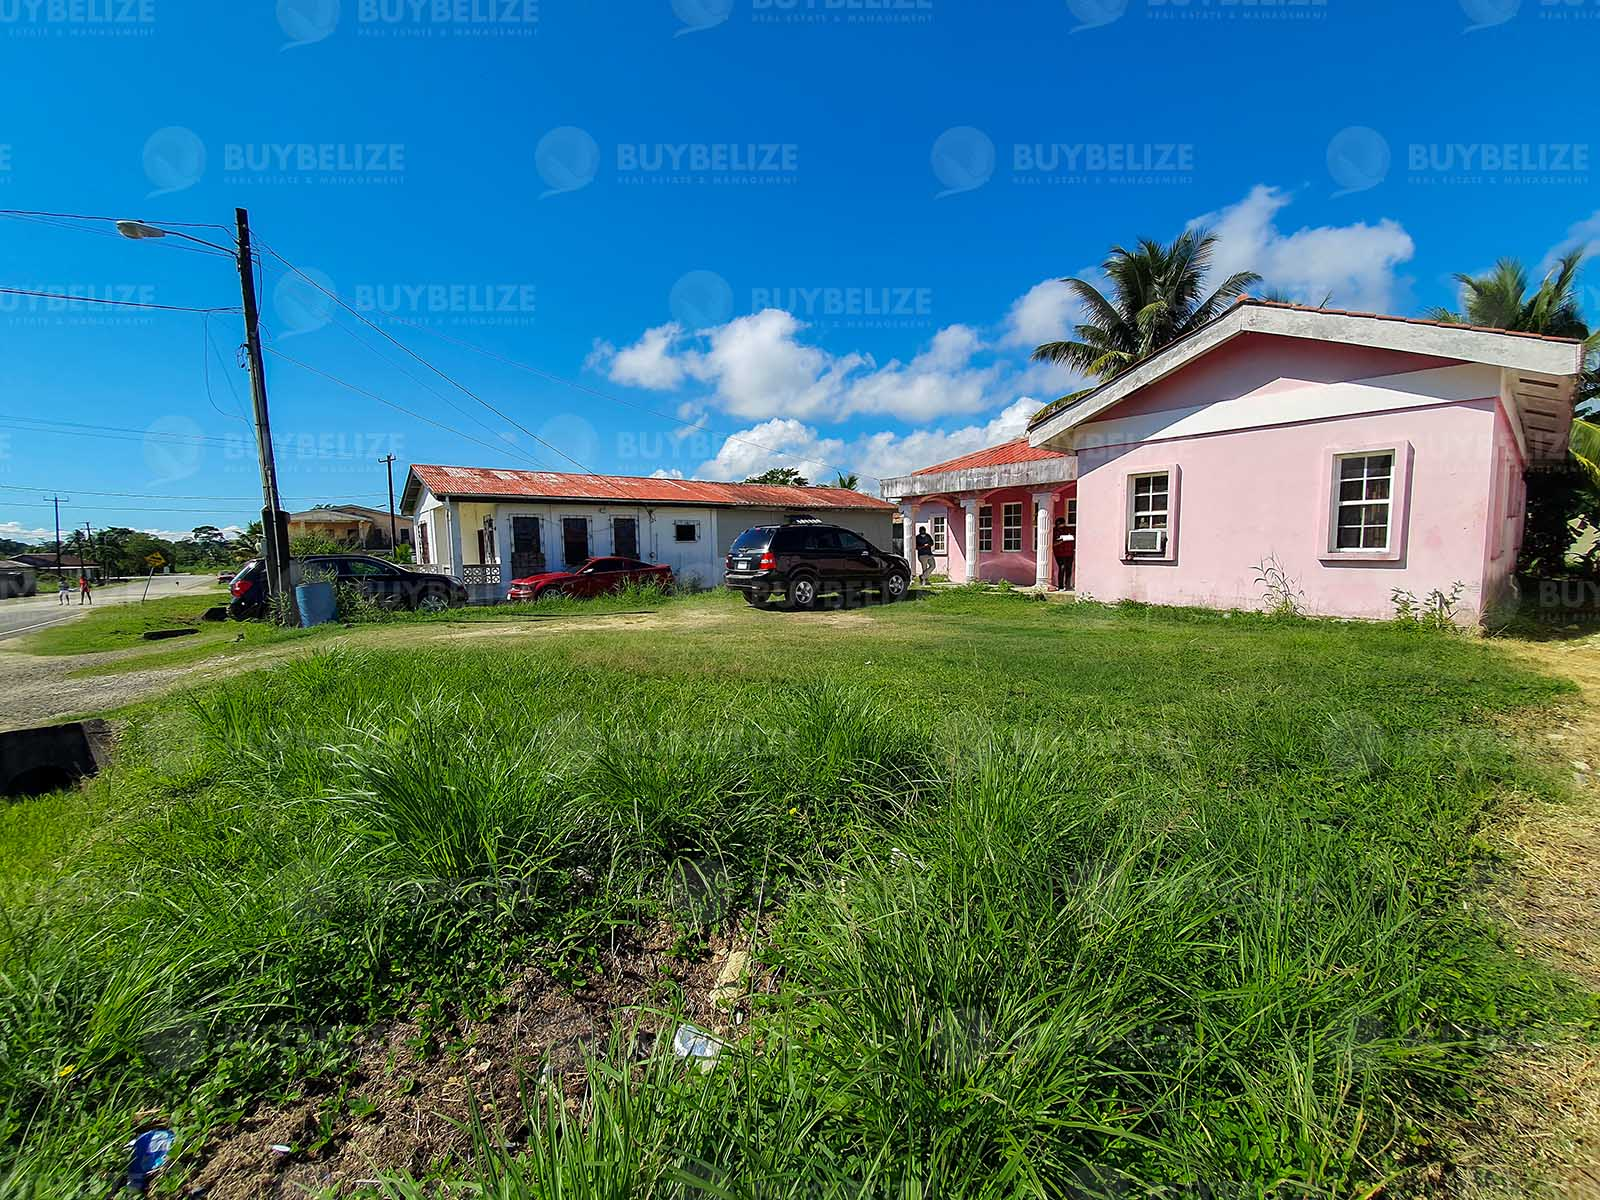 3 Bed 1 Bath House for Sale in Punta Gorda Town Belize